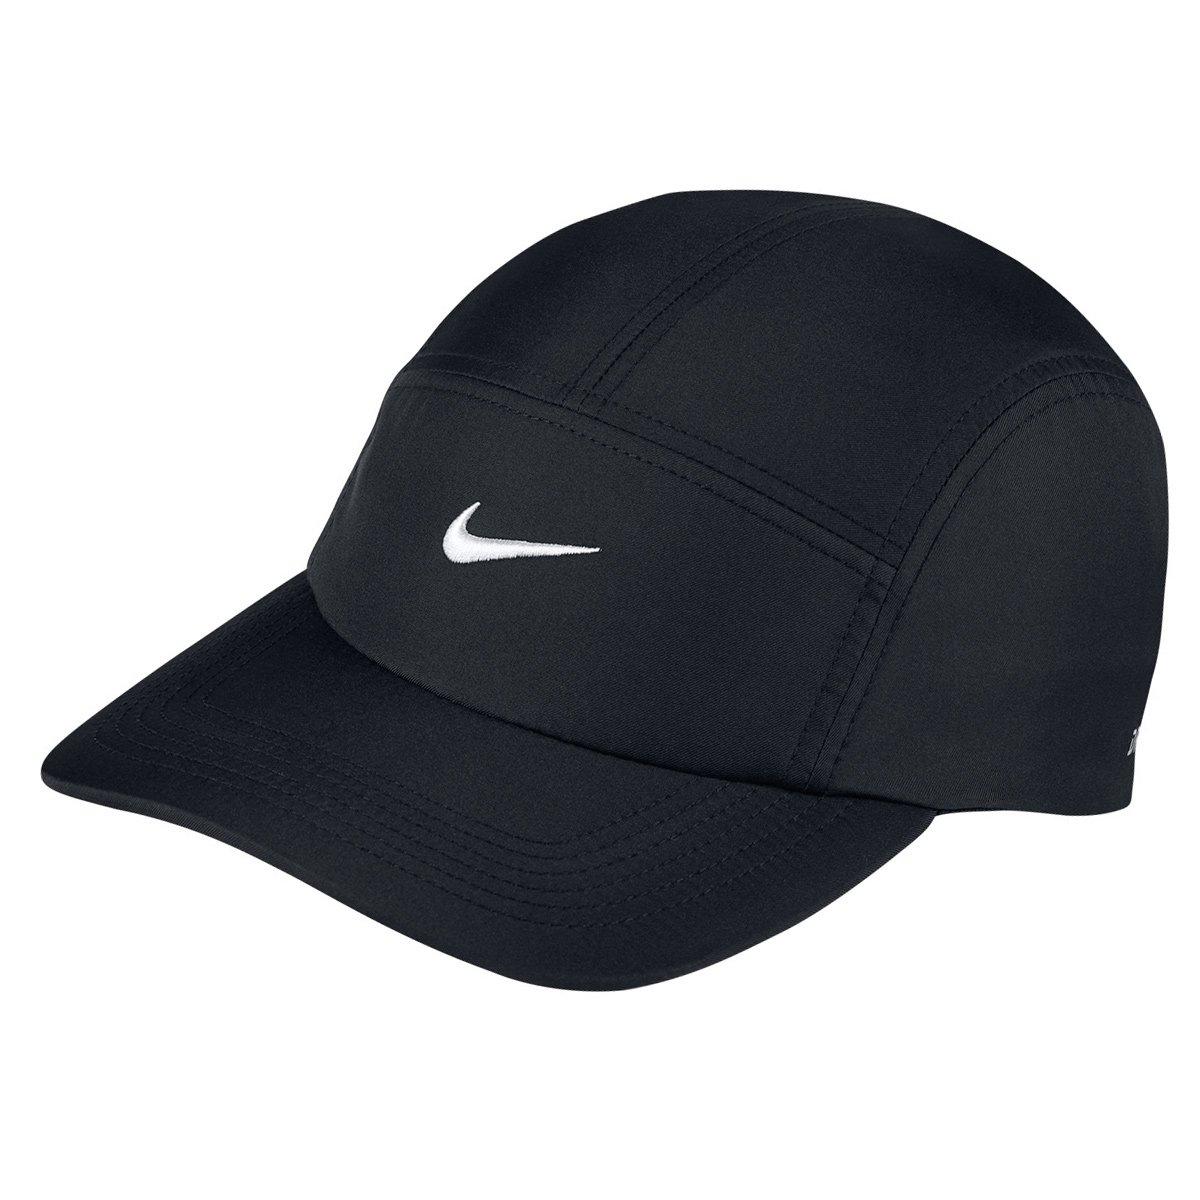 Boné Nike Aba Curva Aw84 Core - Compre Agora  c12597f0781